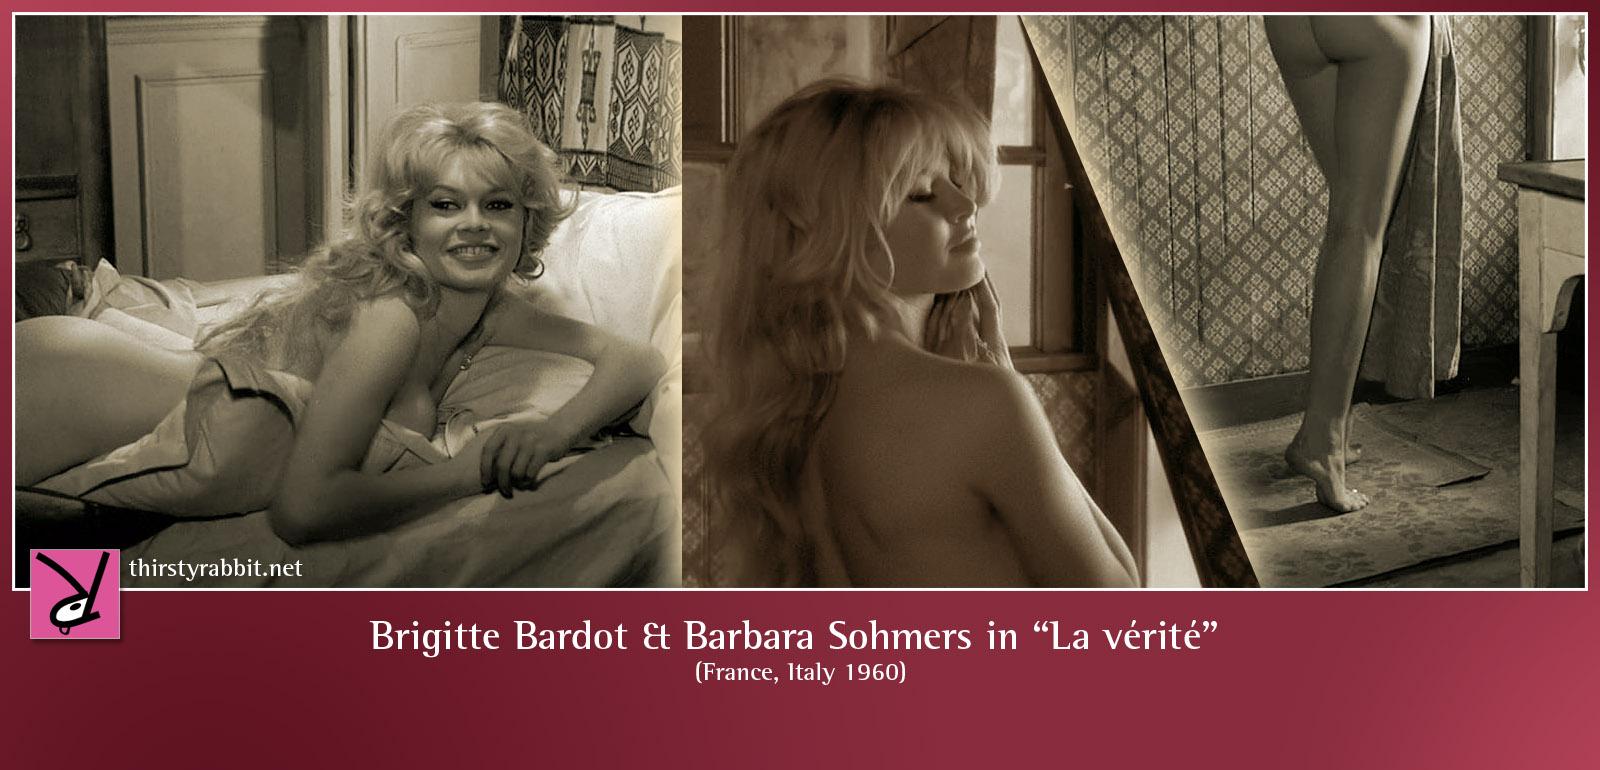 a complicated woman: early brigitte bardot | thirstyrabbit